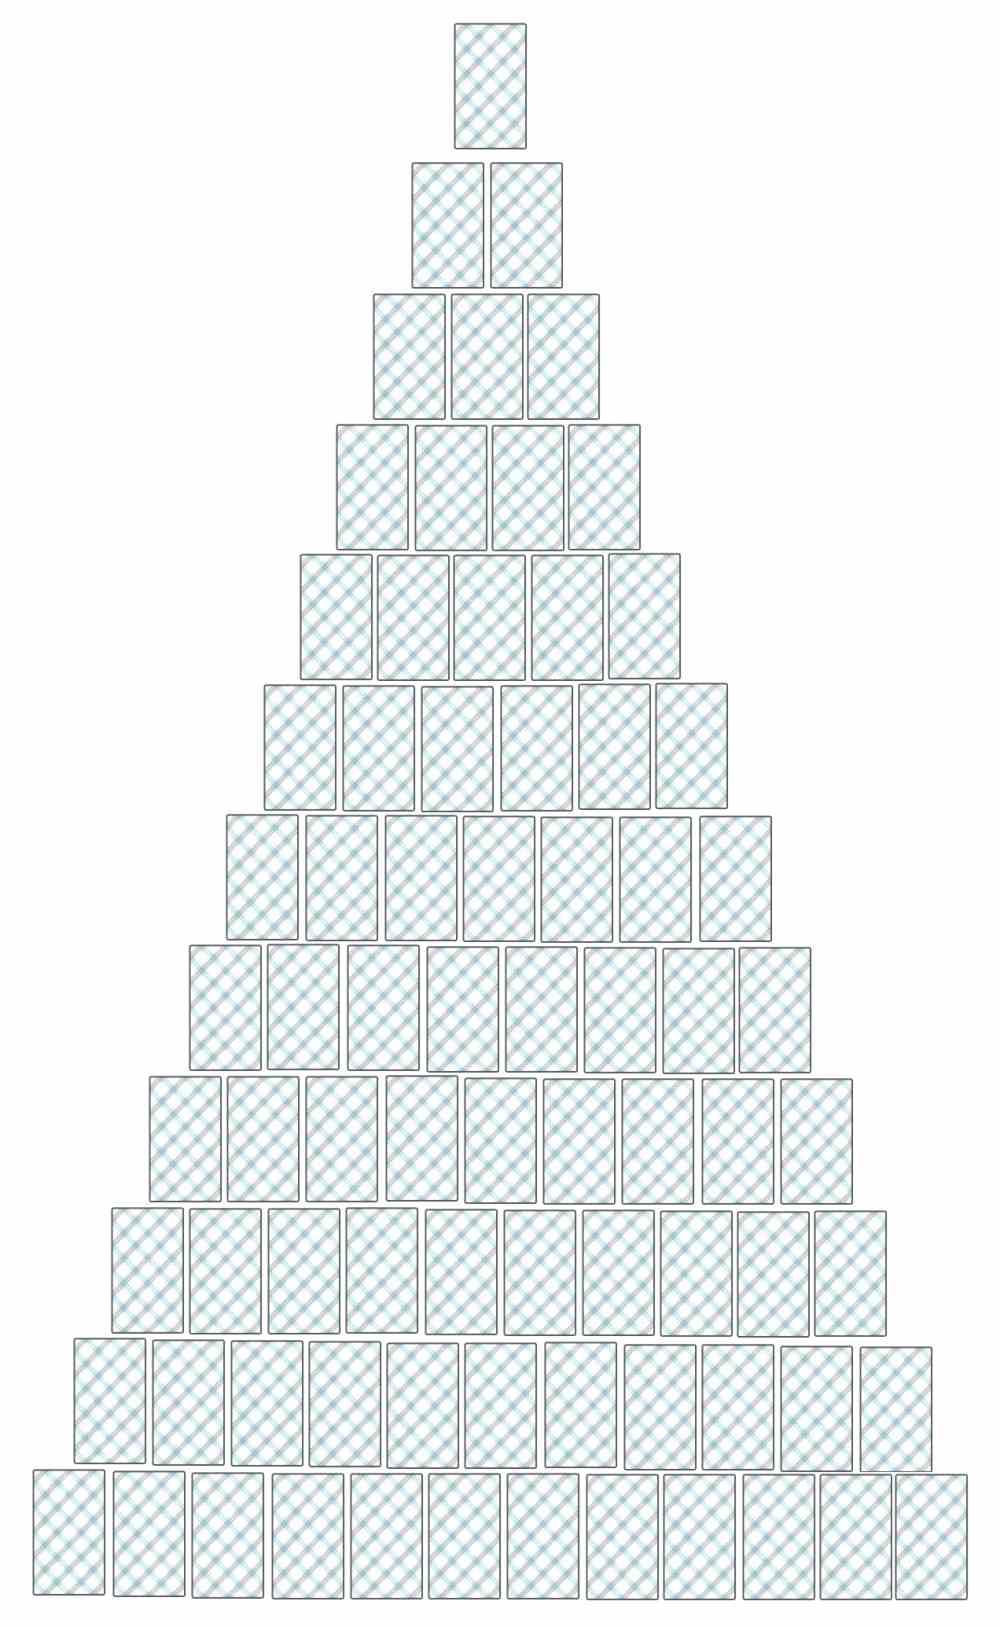 pyramid tarot spread